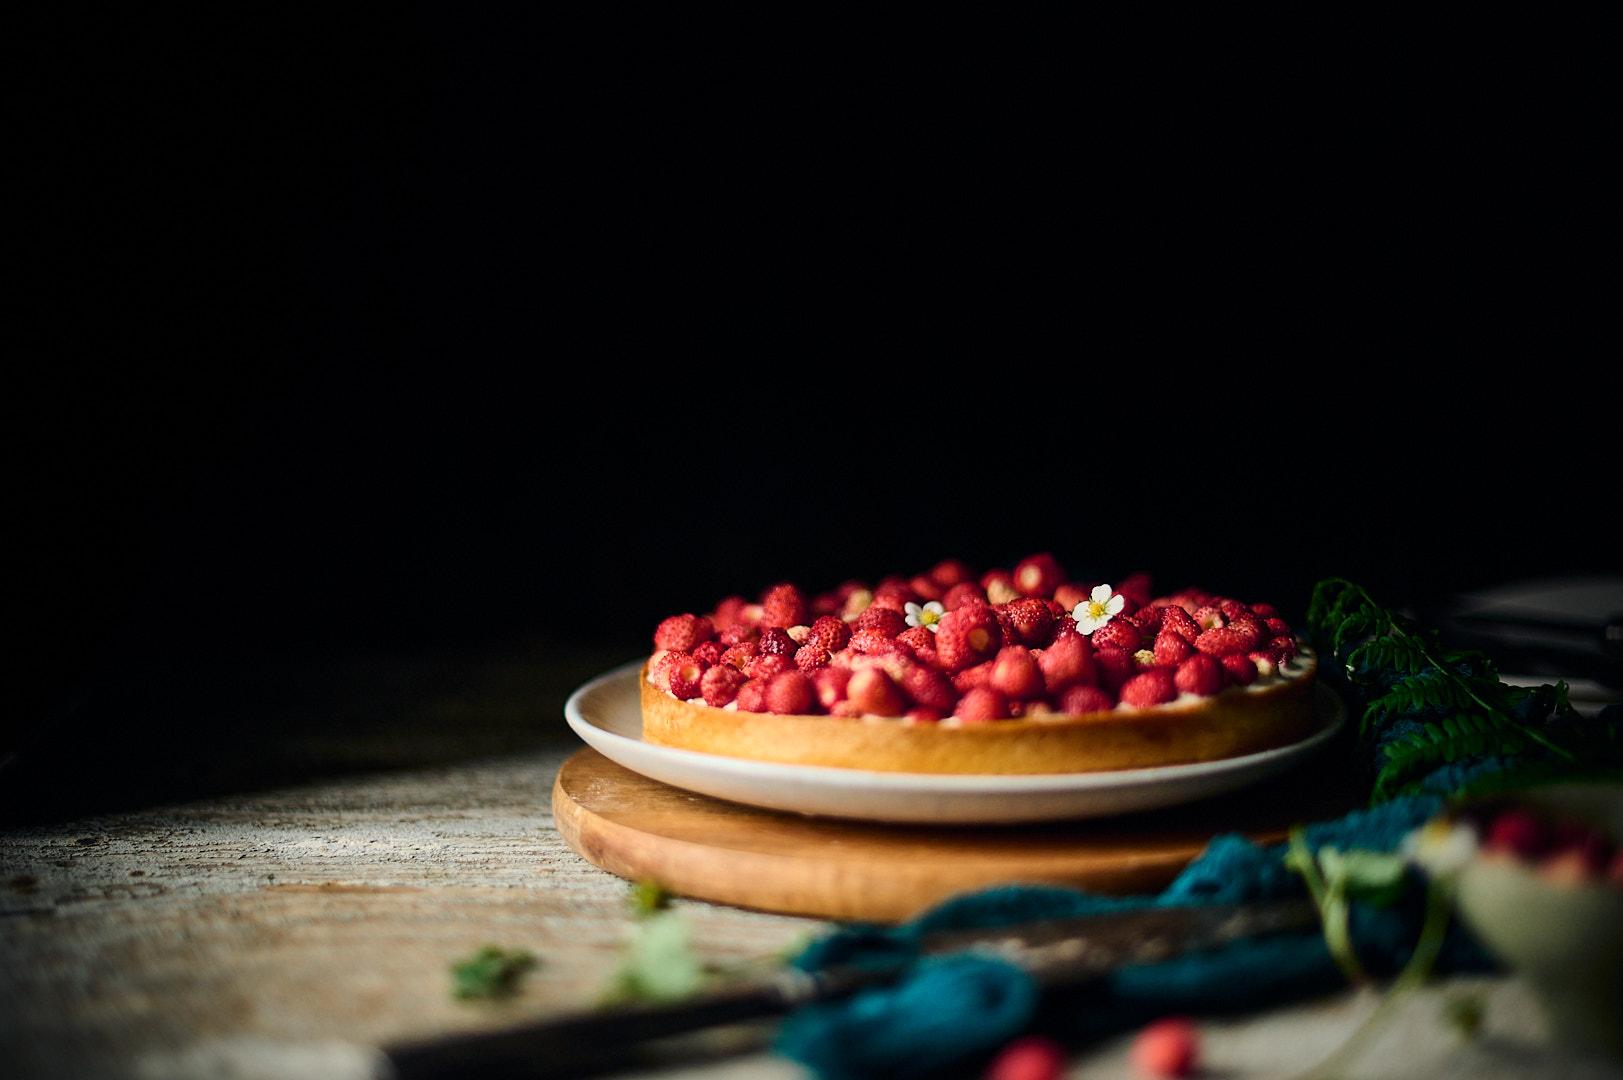 Tarte fraises des bois